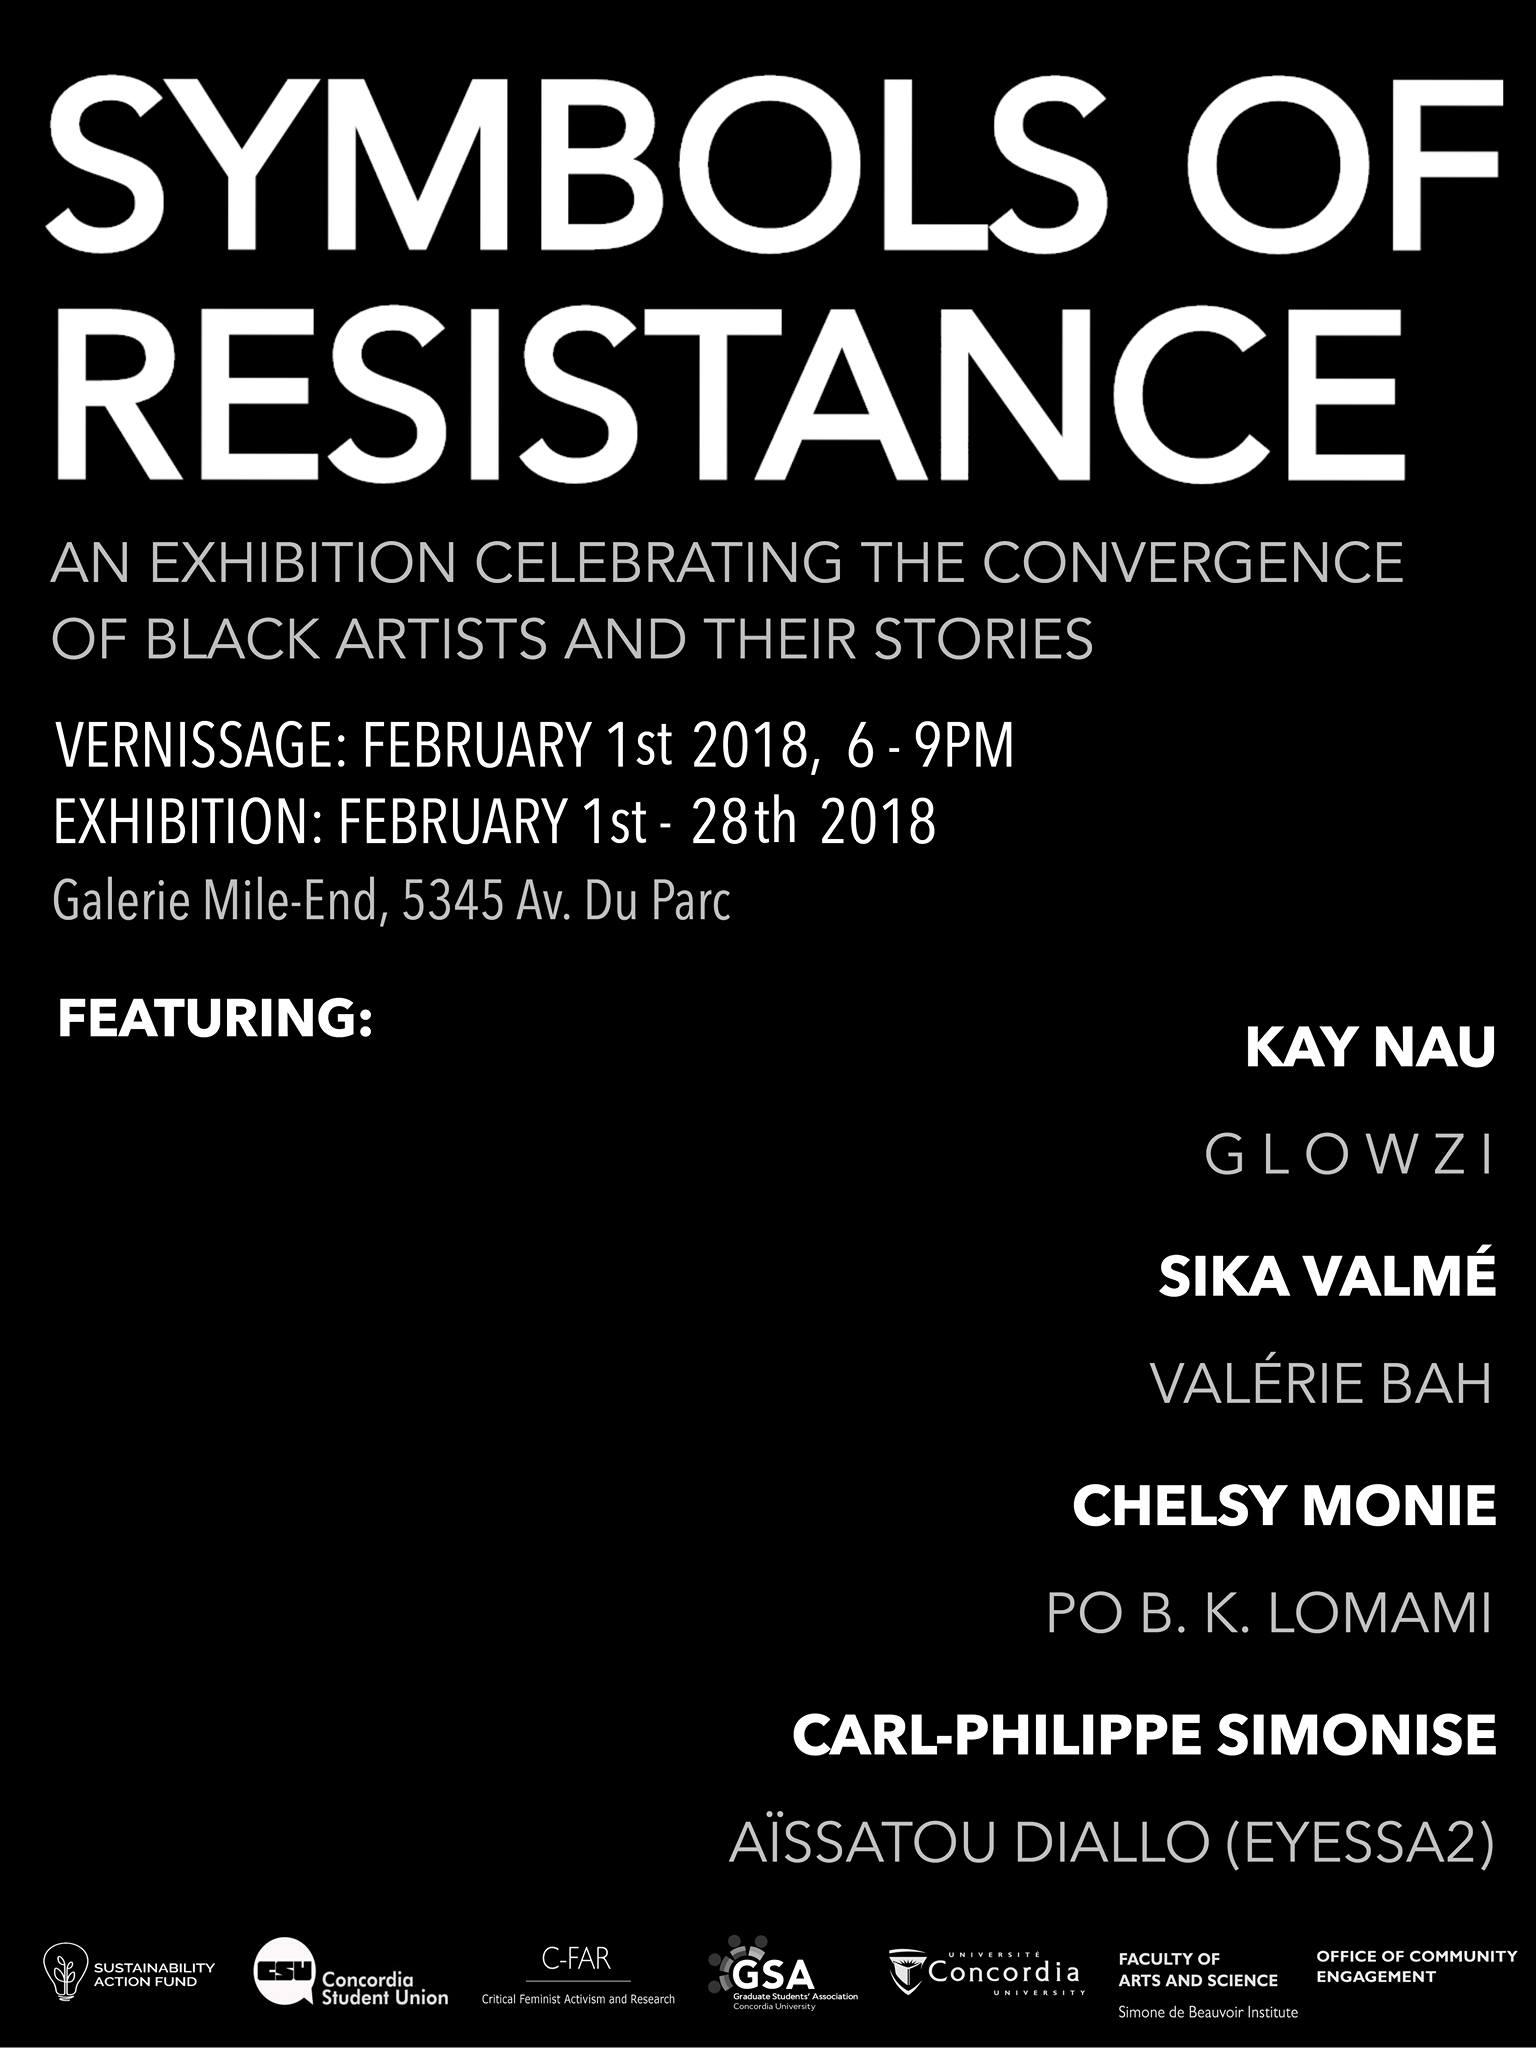 Symbols of Resistance